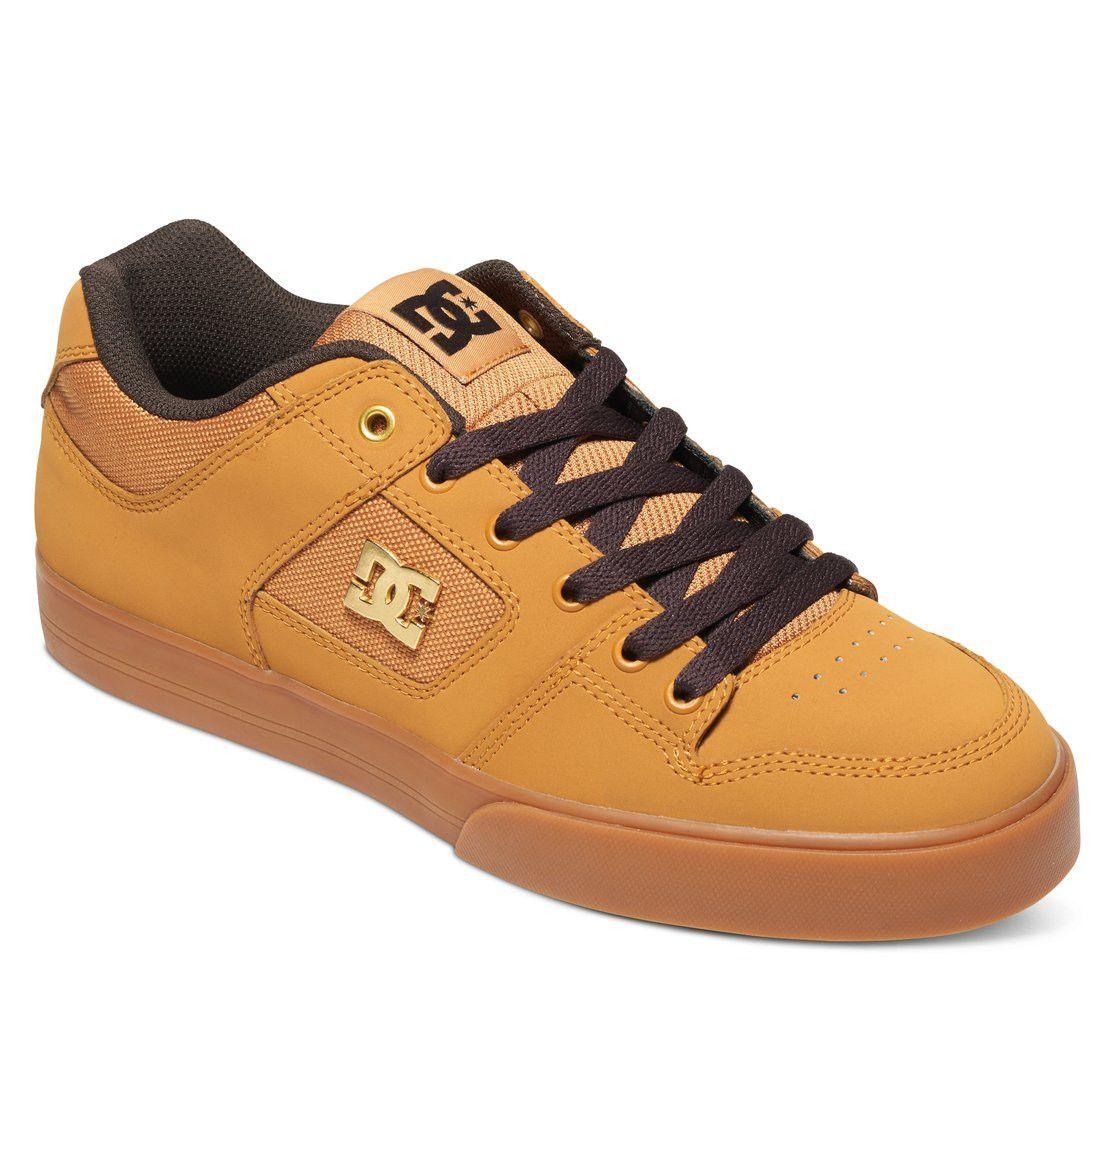 DC Shoes Crisis High WNT, Sneakers Basses Homme, Marron (Wheat/DK Chocolate), 45 EU